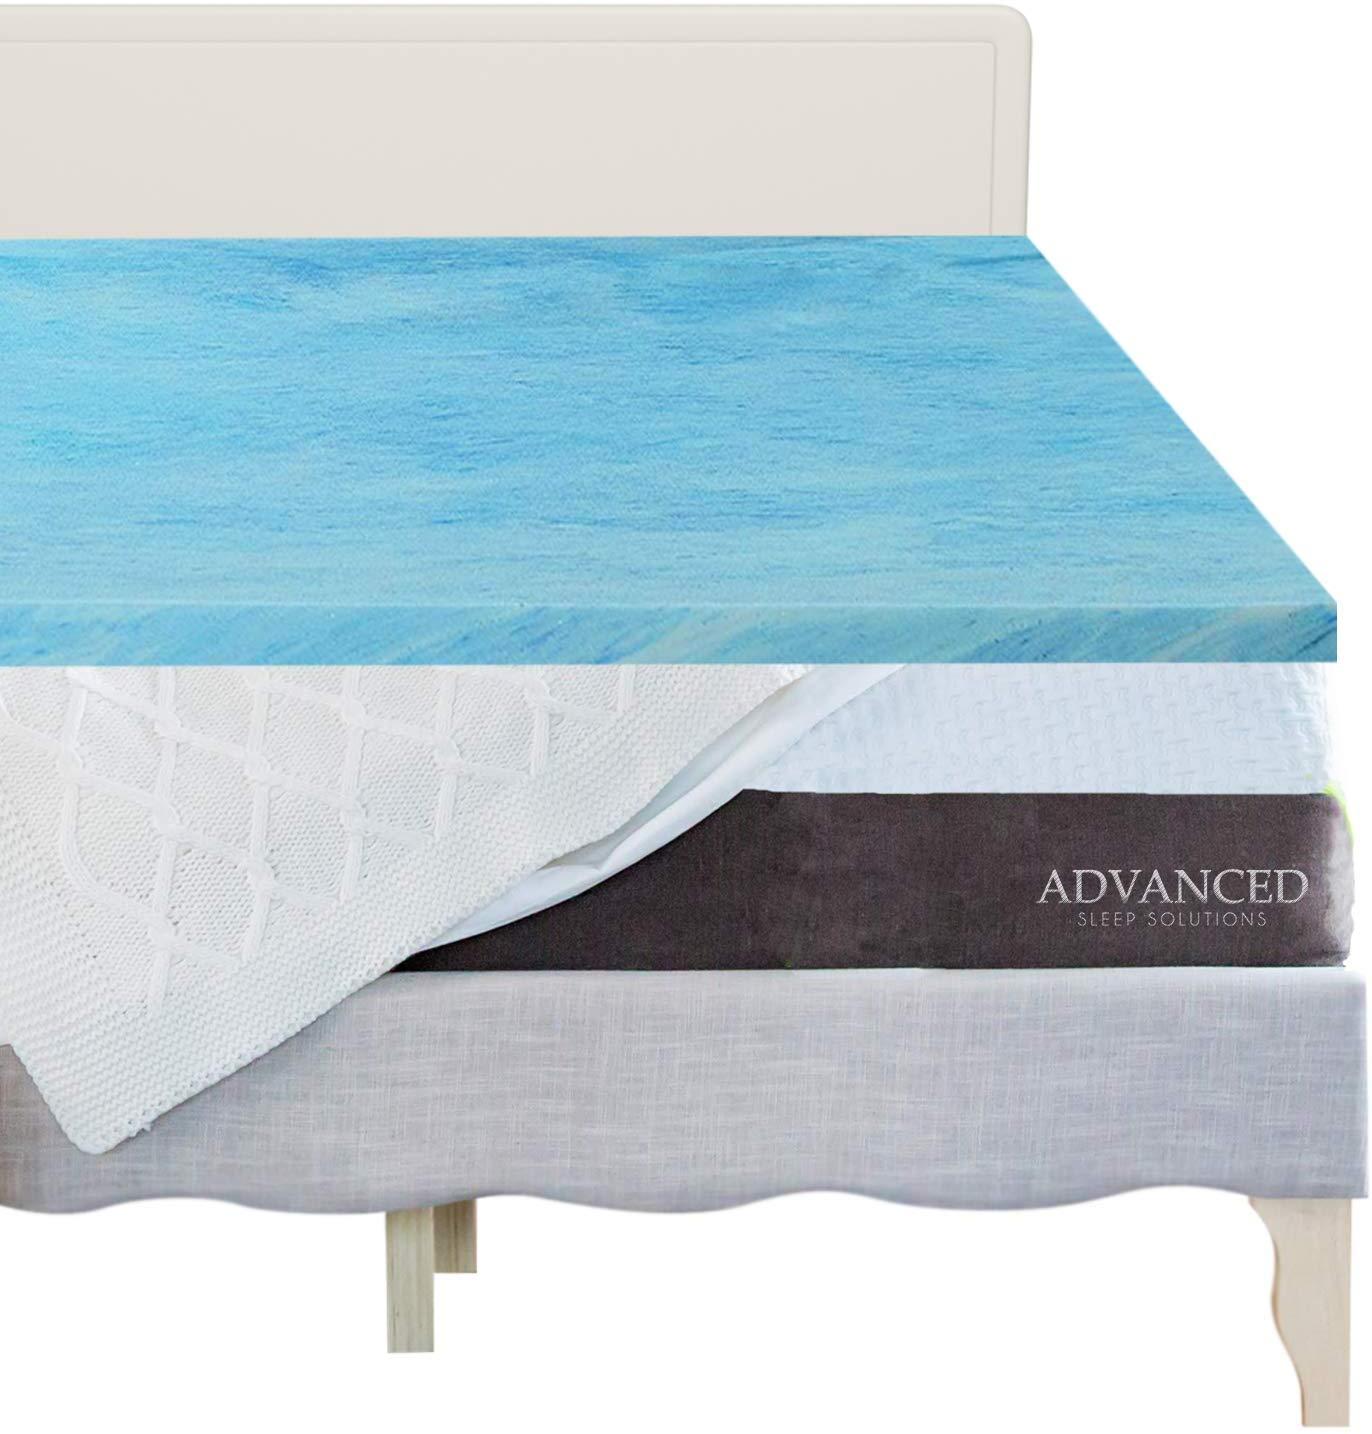 Advanced Sleep Solutions best memory foam mattress topper review by www.dailysleep.org